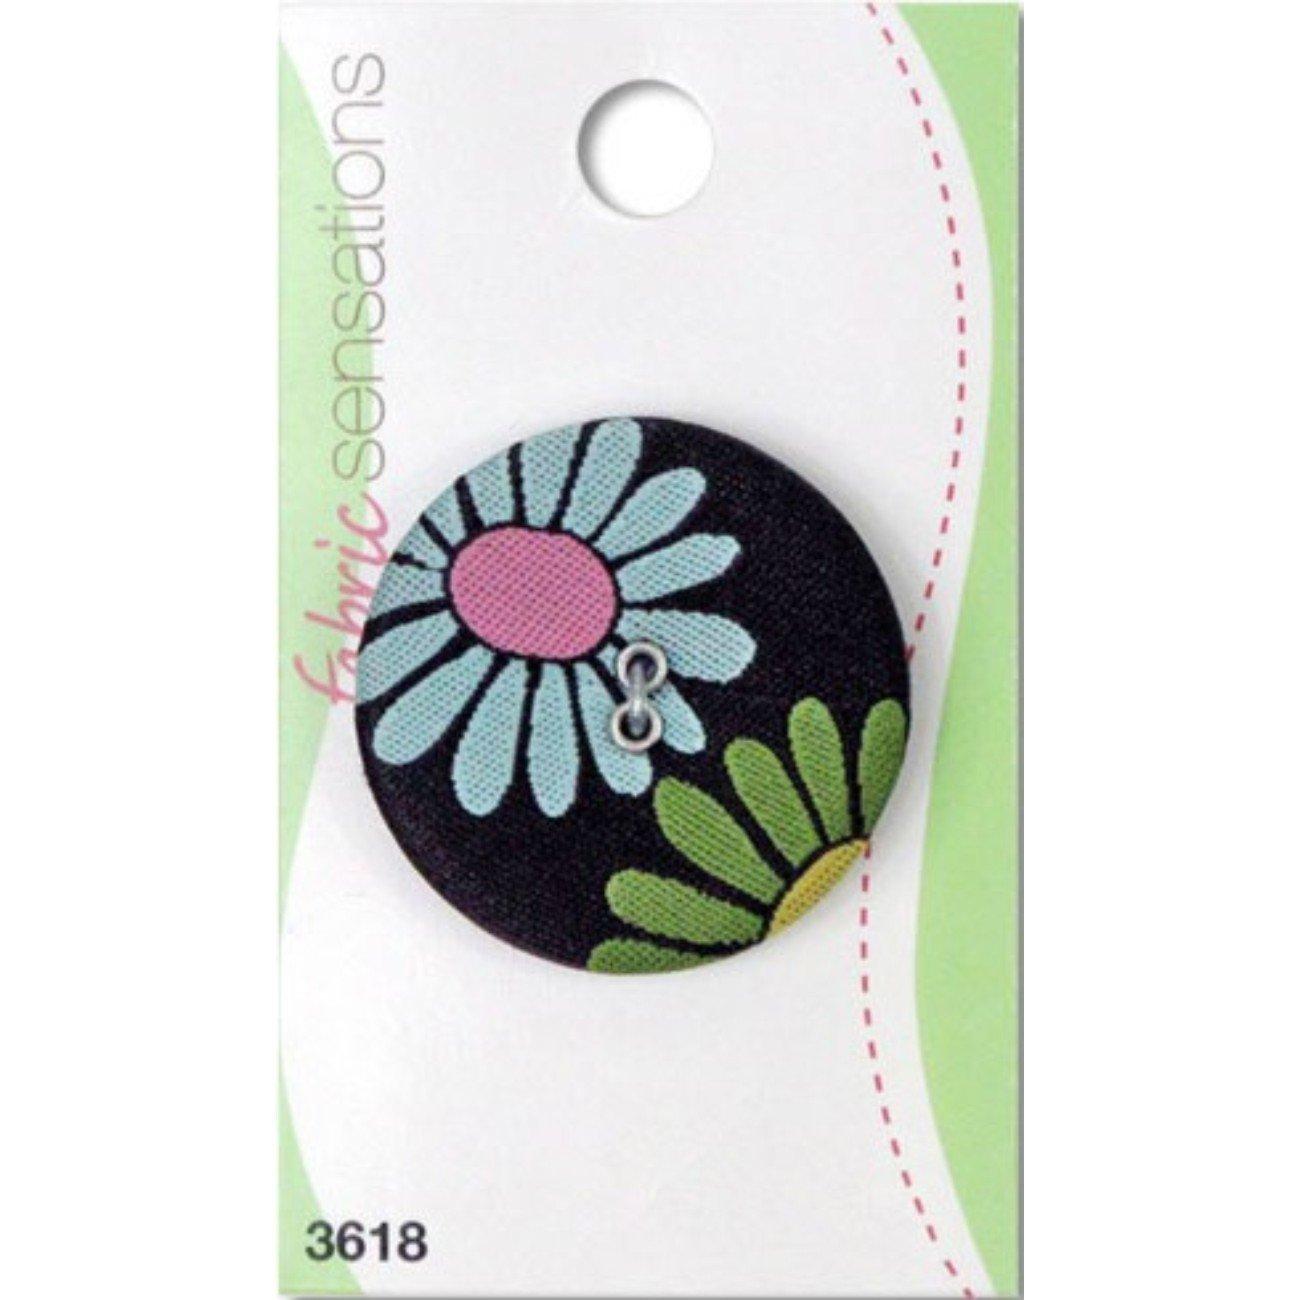 Fabric Sensations - Mod Flowers 1-3/8 Button